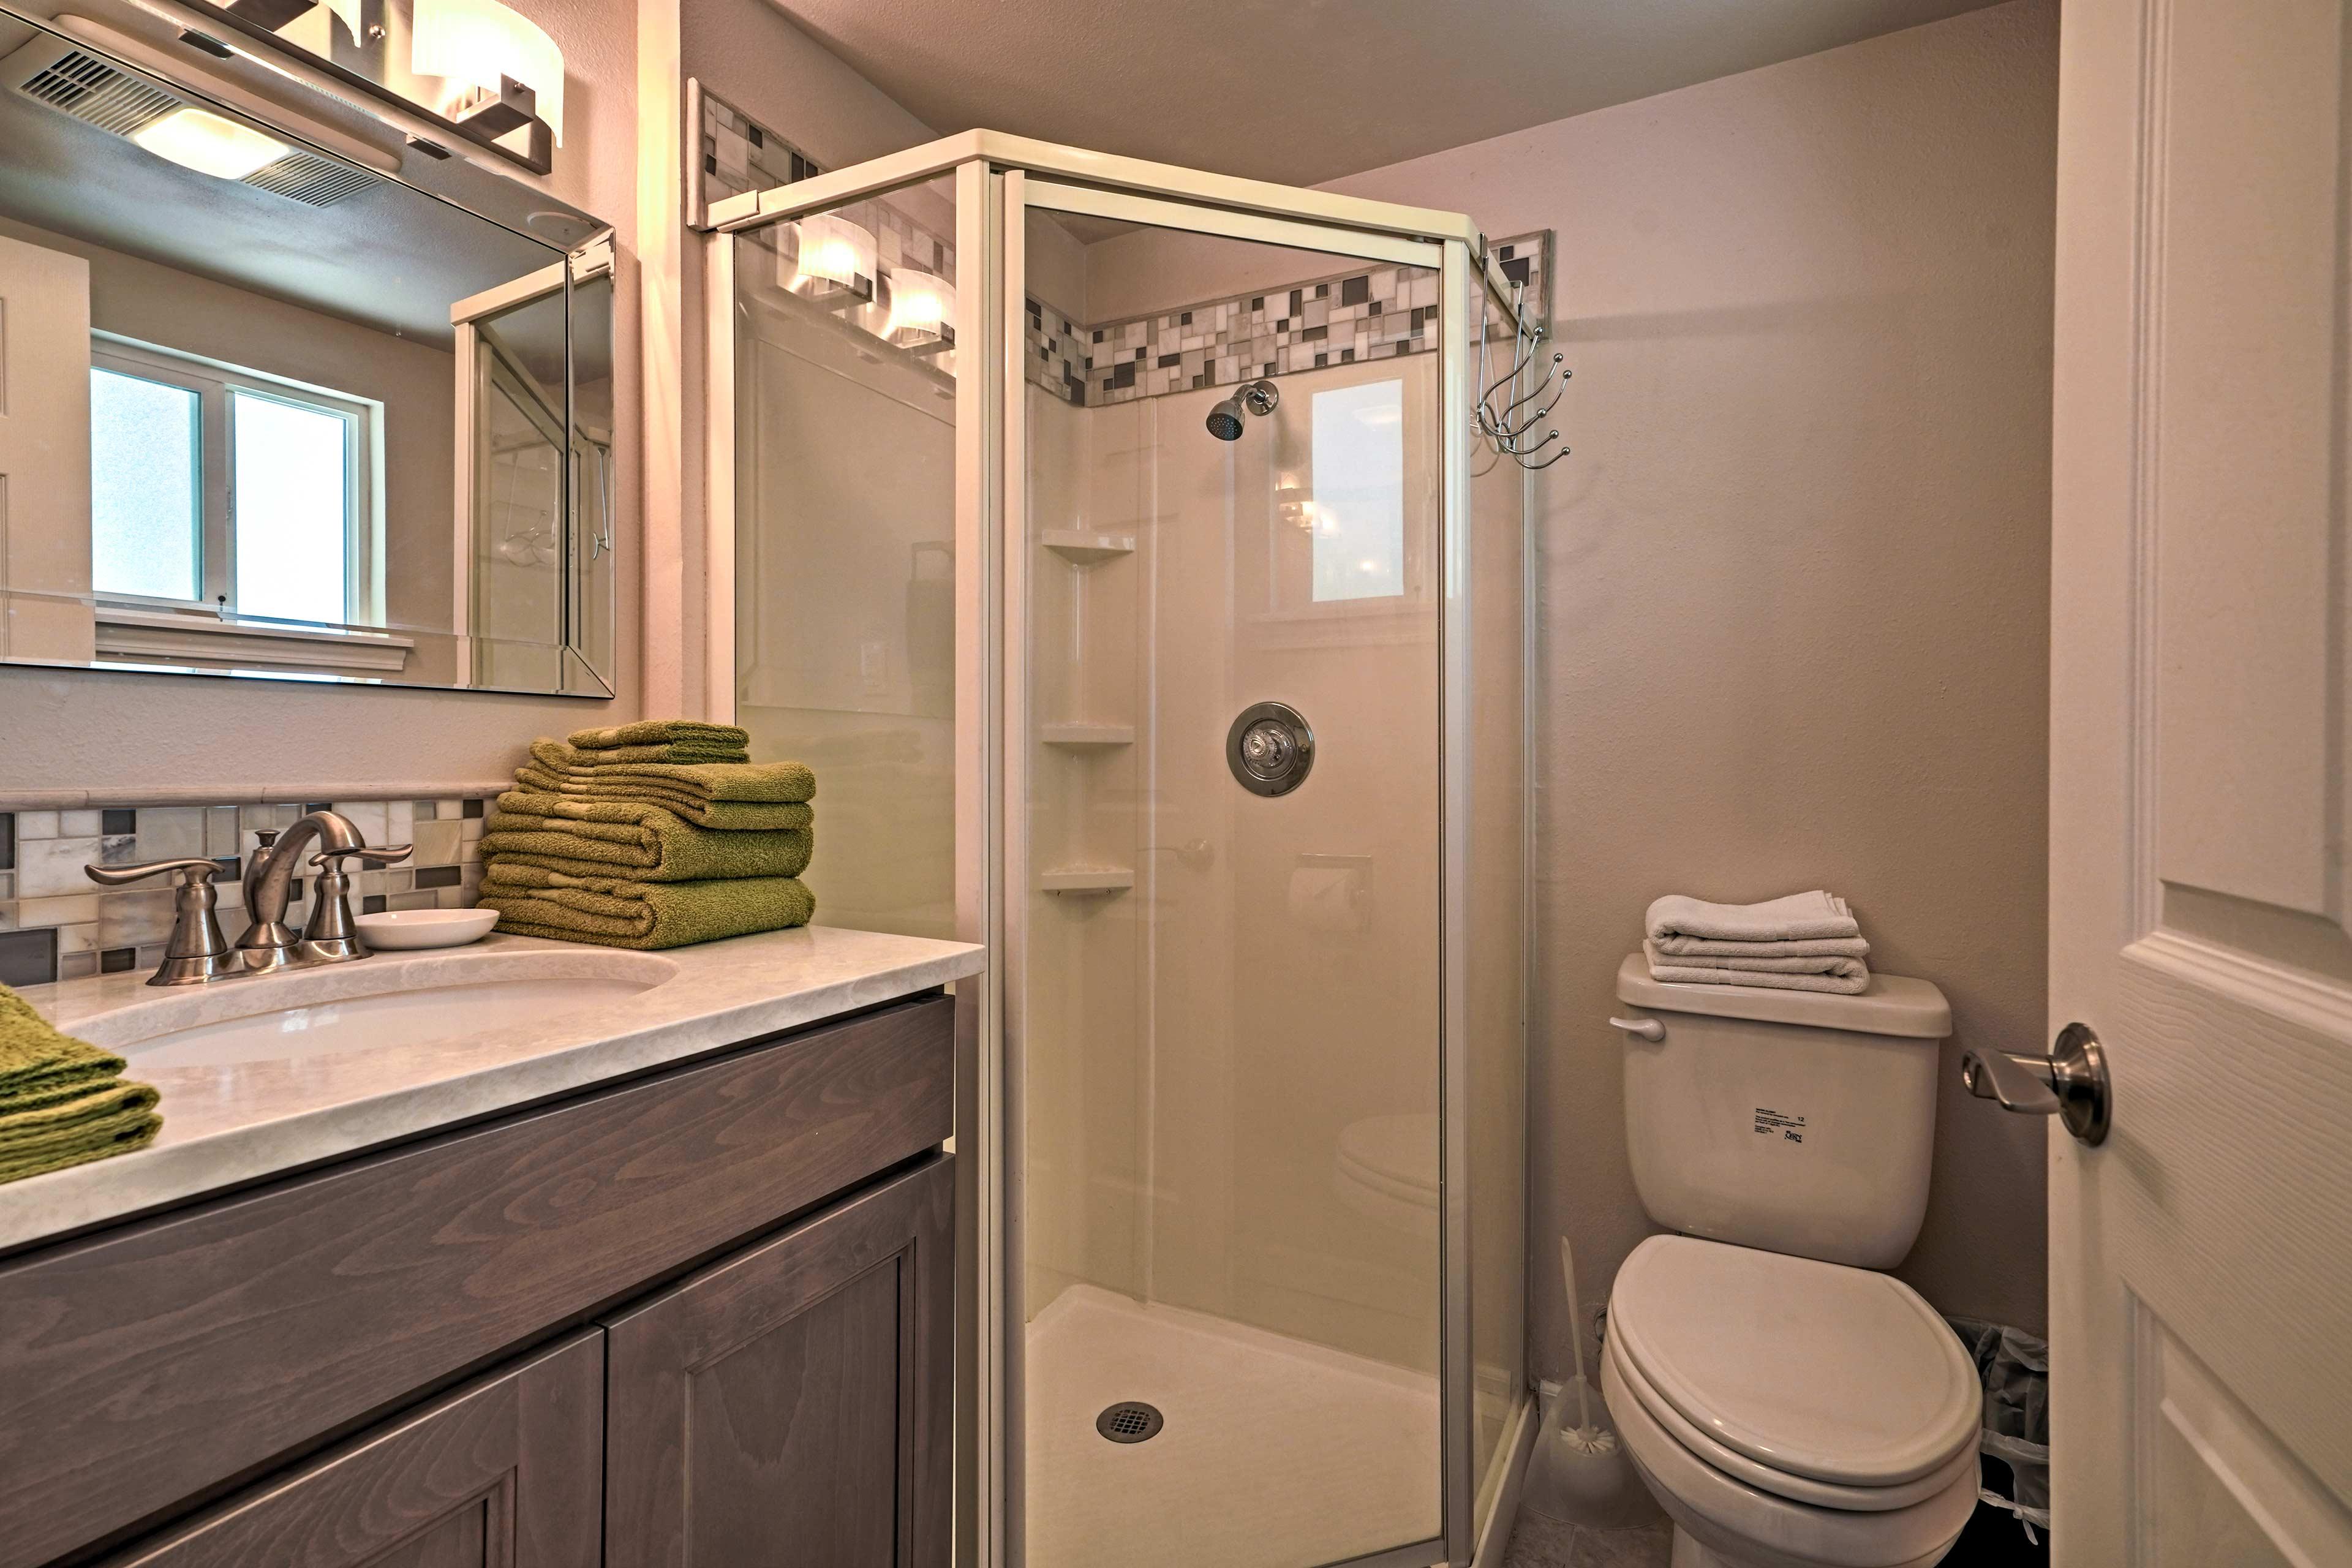 The en-suite bathroom boasts a walk-in shower.